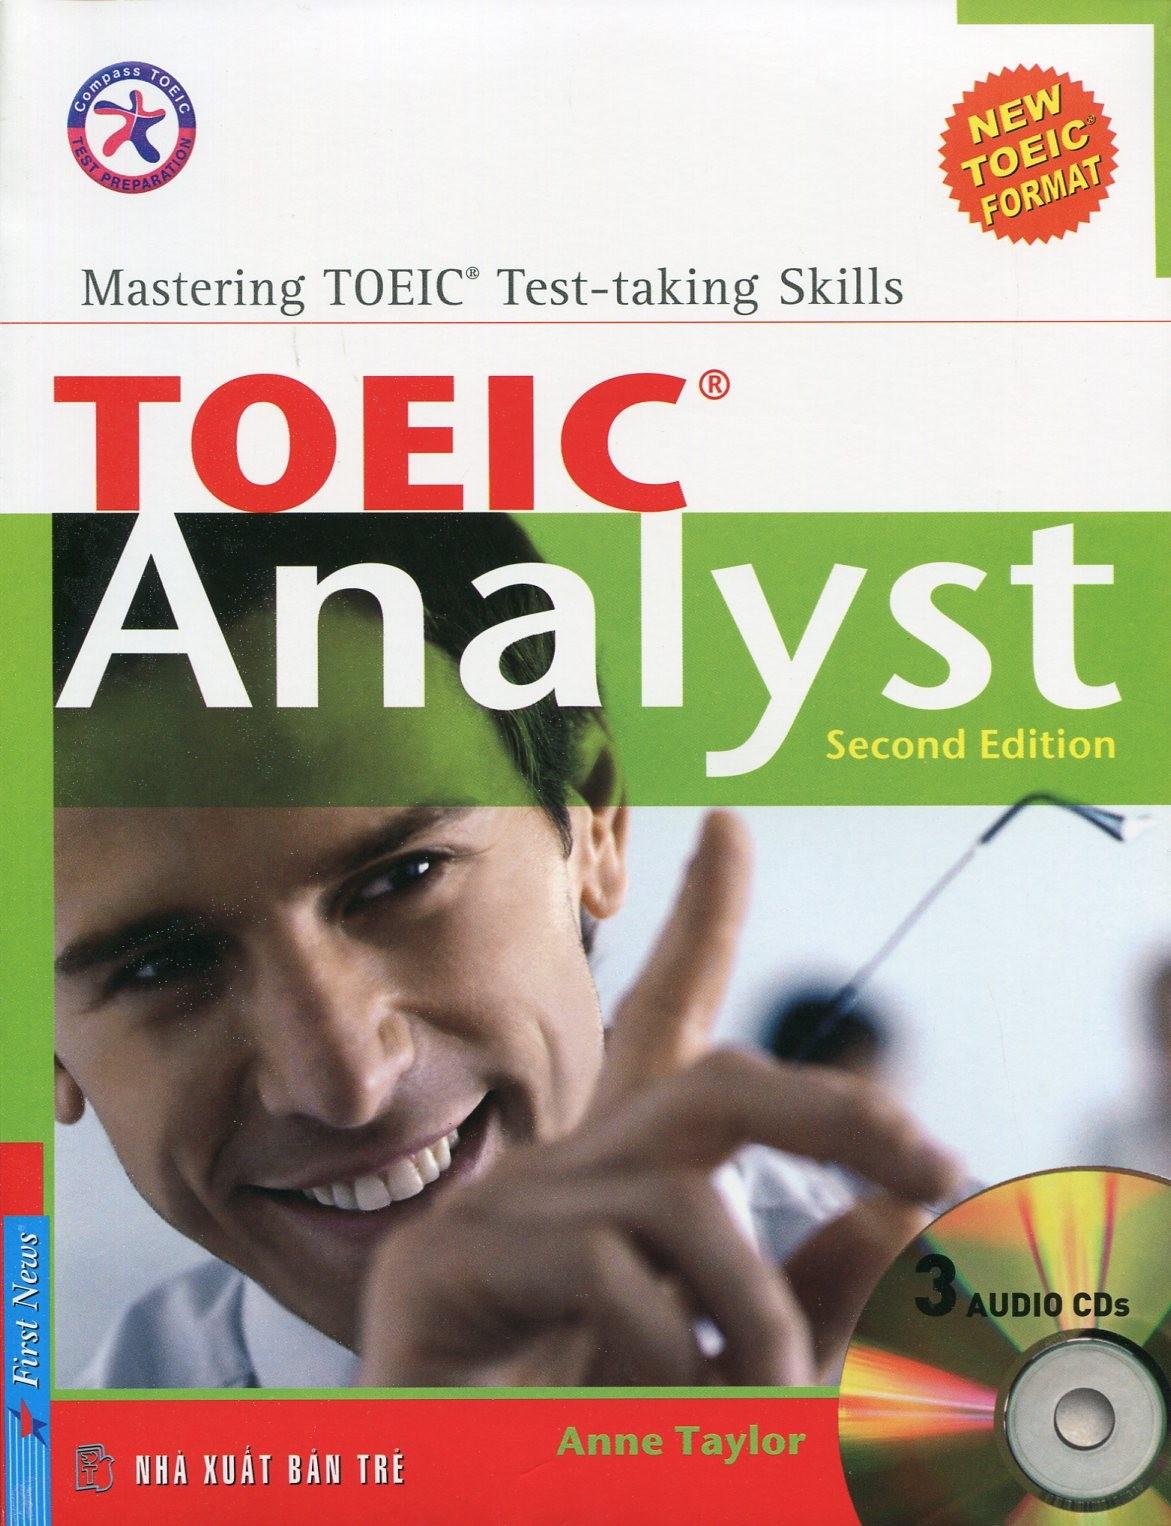 toeic-analyst